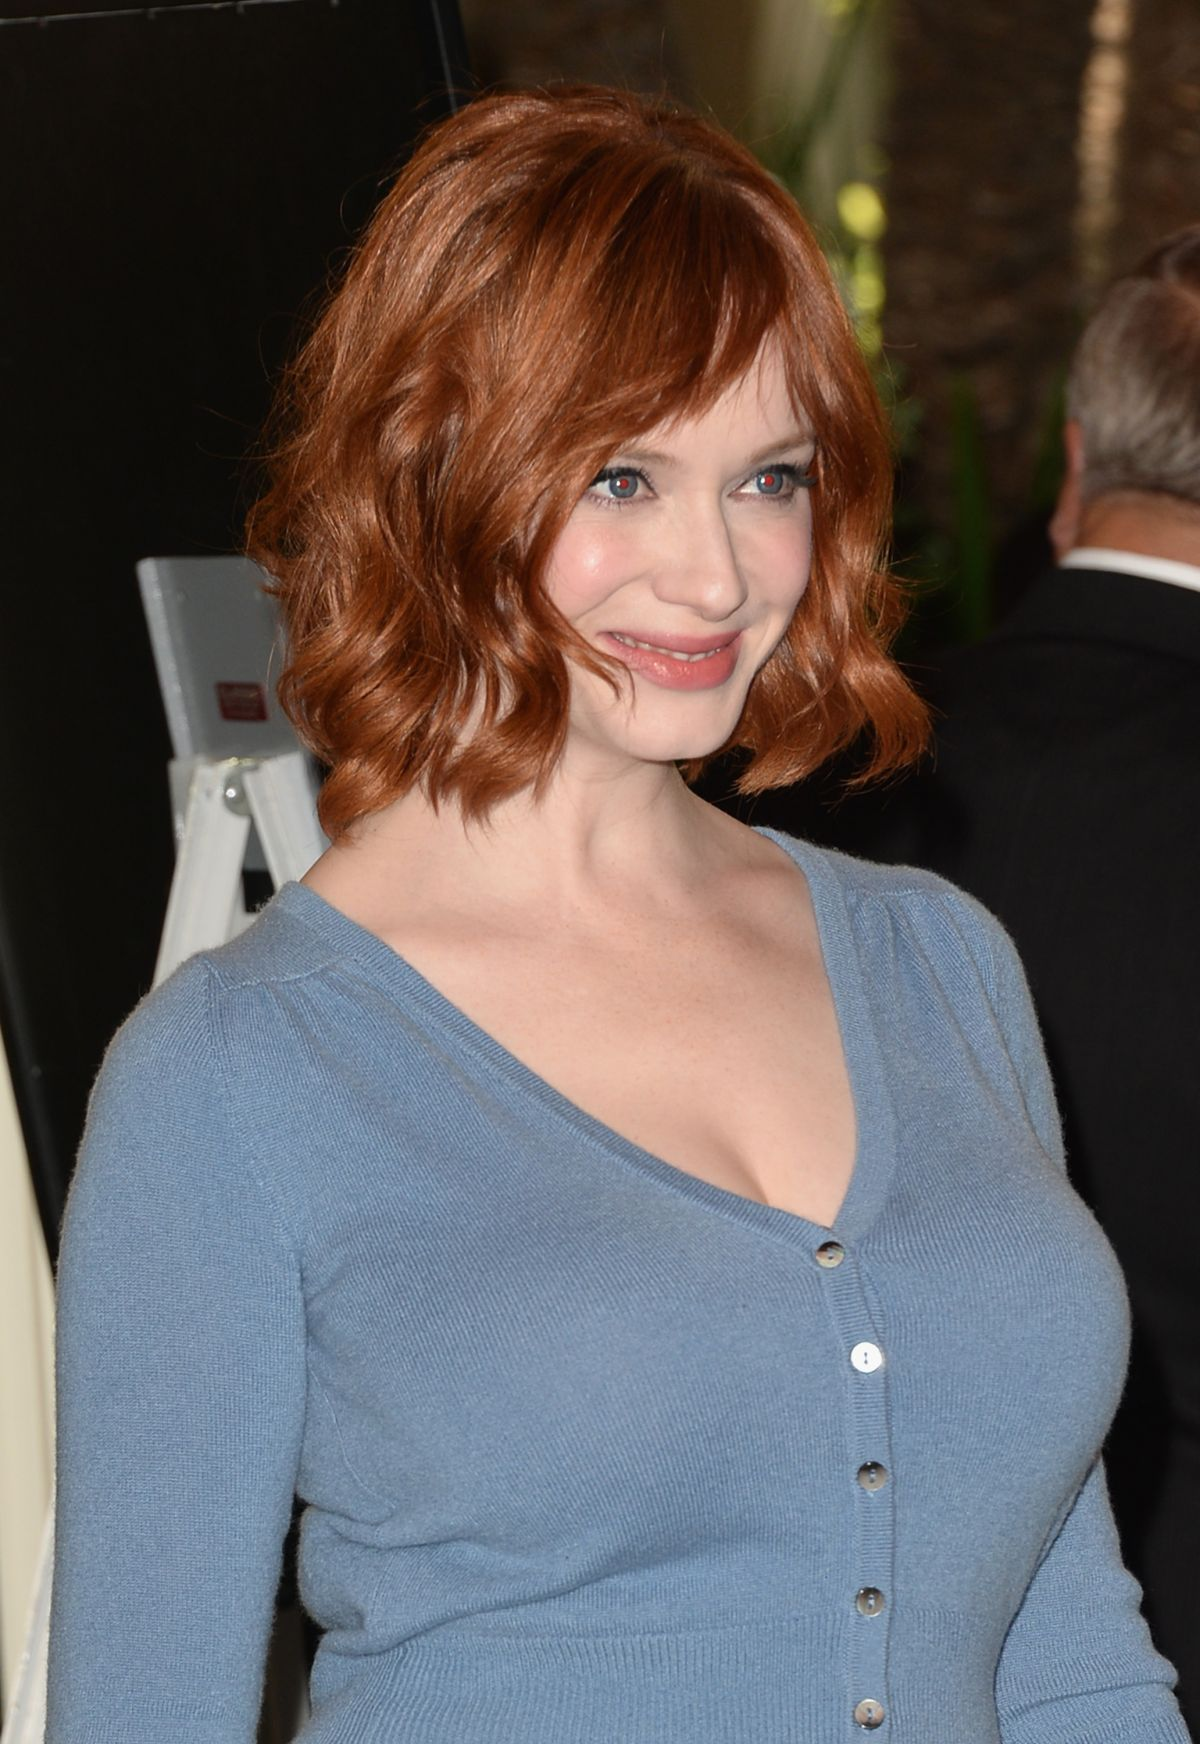 Christina Hendricks Photos Photos - 13th Annual AFI Awards